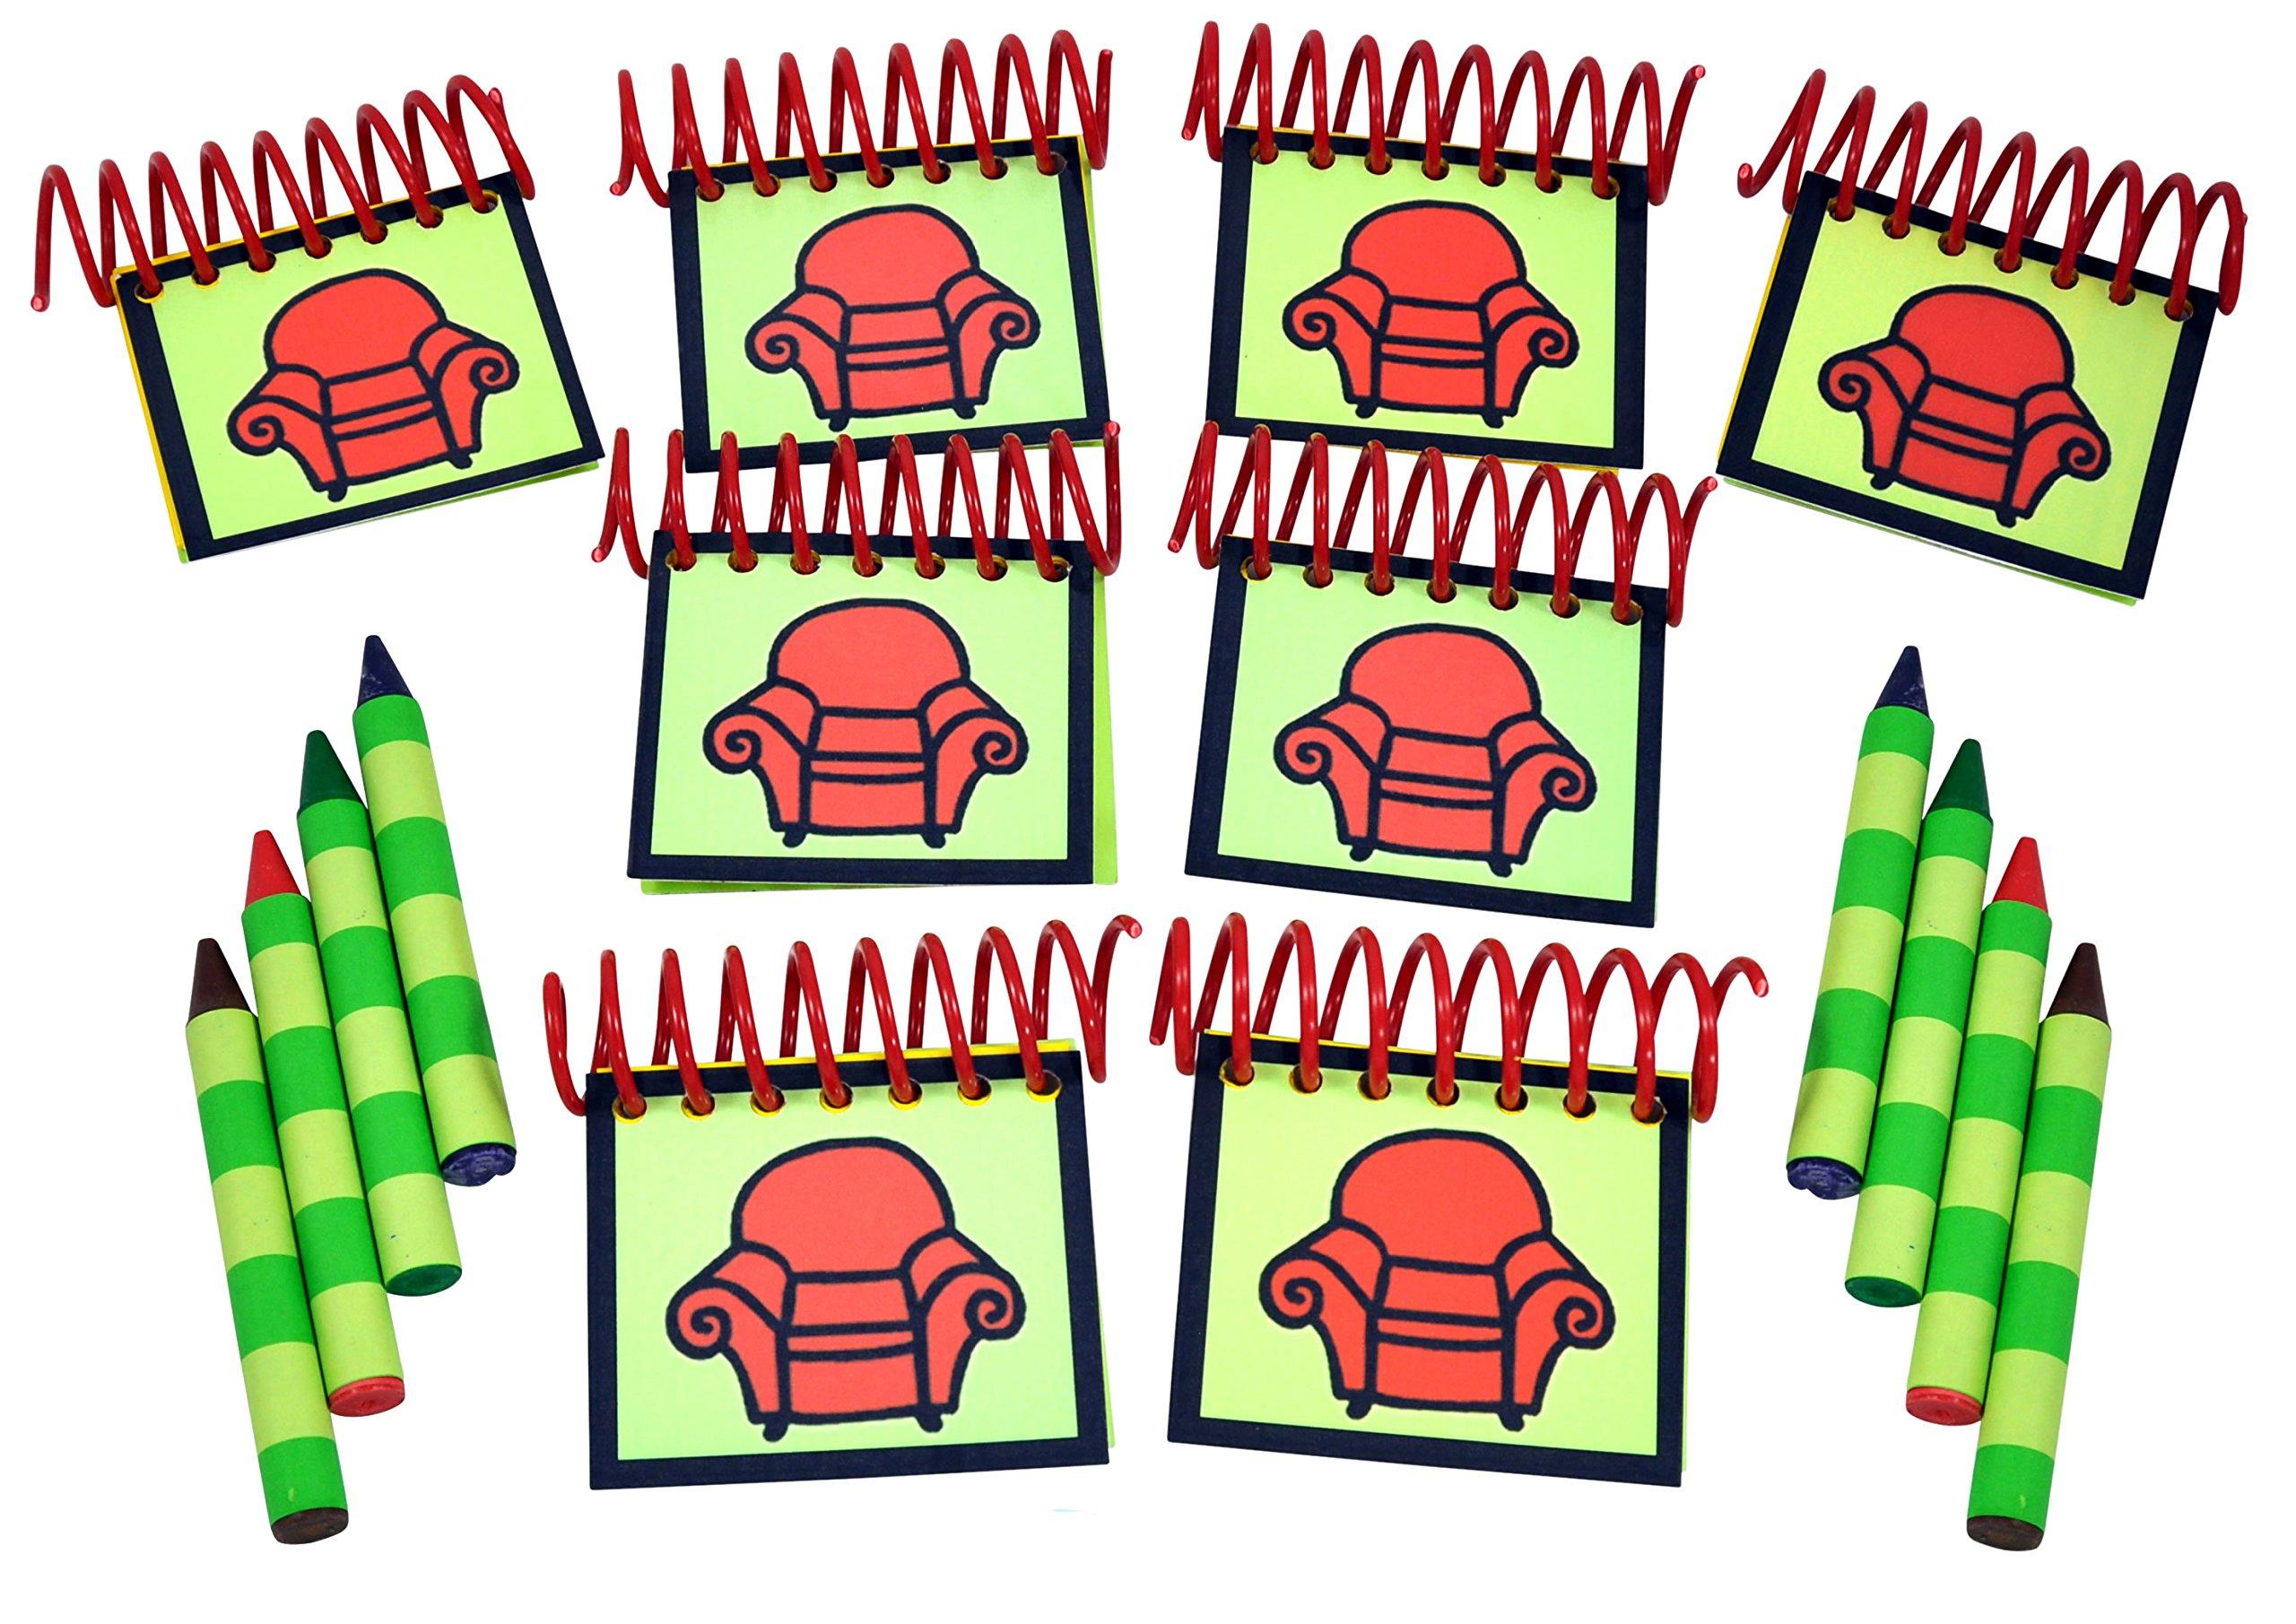 Handcrafted Handy Dandy Notebook inspired notebooks PARTY PACK by Handcrafted Handy Dandy Notebooks